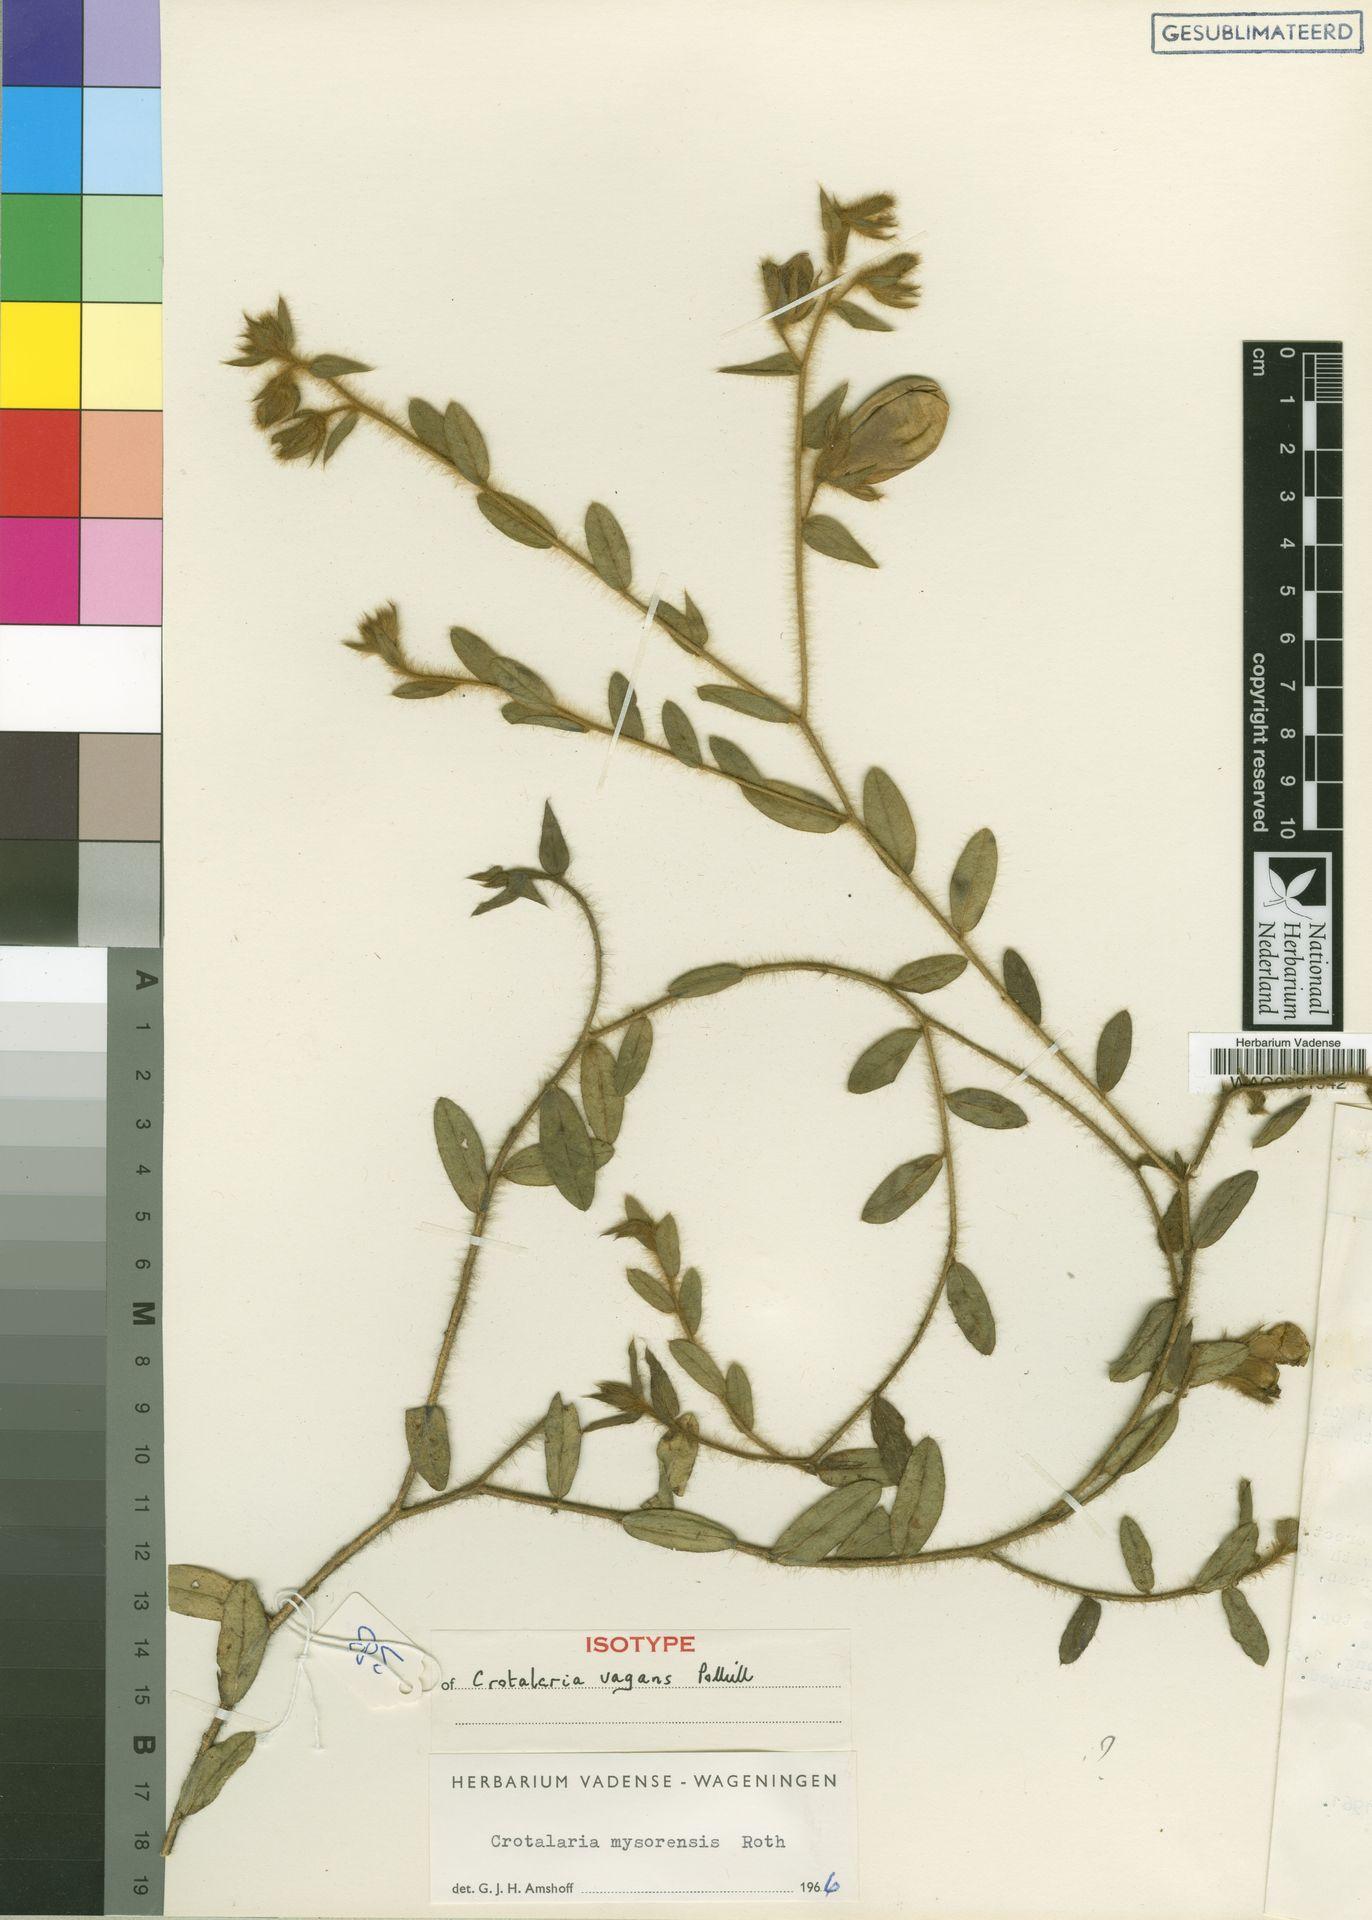 WAG0001942   Crotalaria vagans Polhill